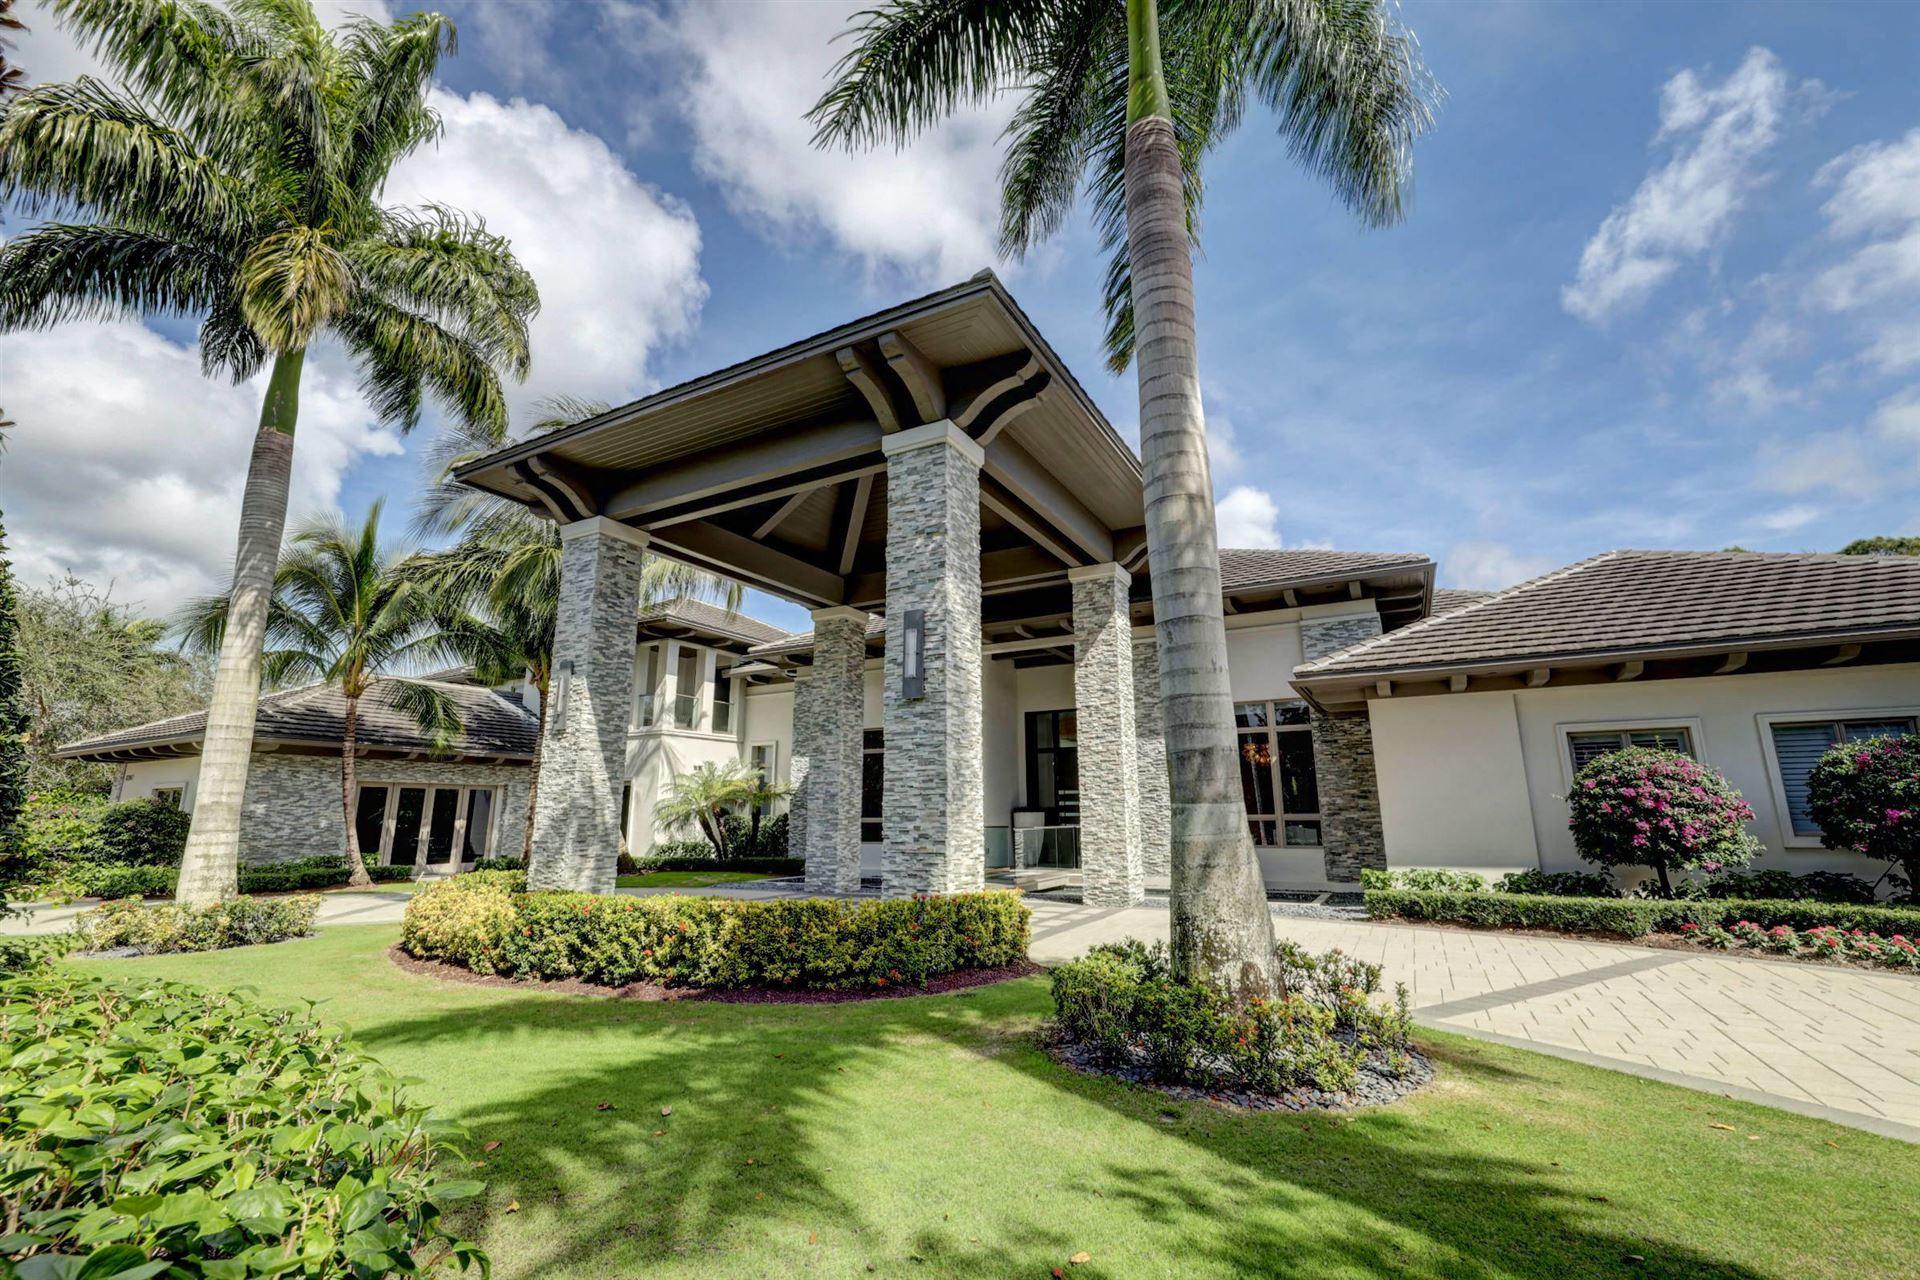 Photo of 12247 Tillinghast Circle, Palm Beach Gardens, FL 33418 (MLS # RX-10602459)